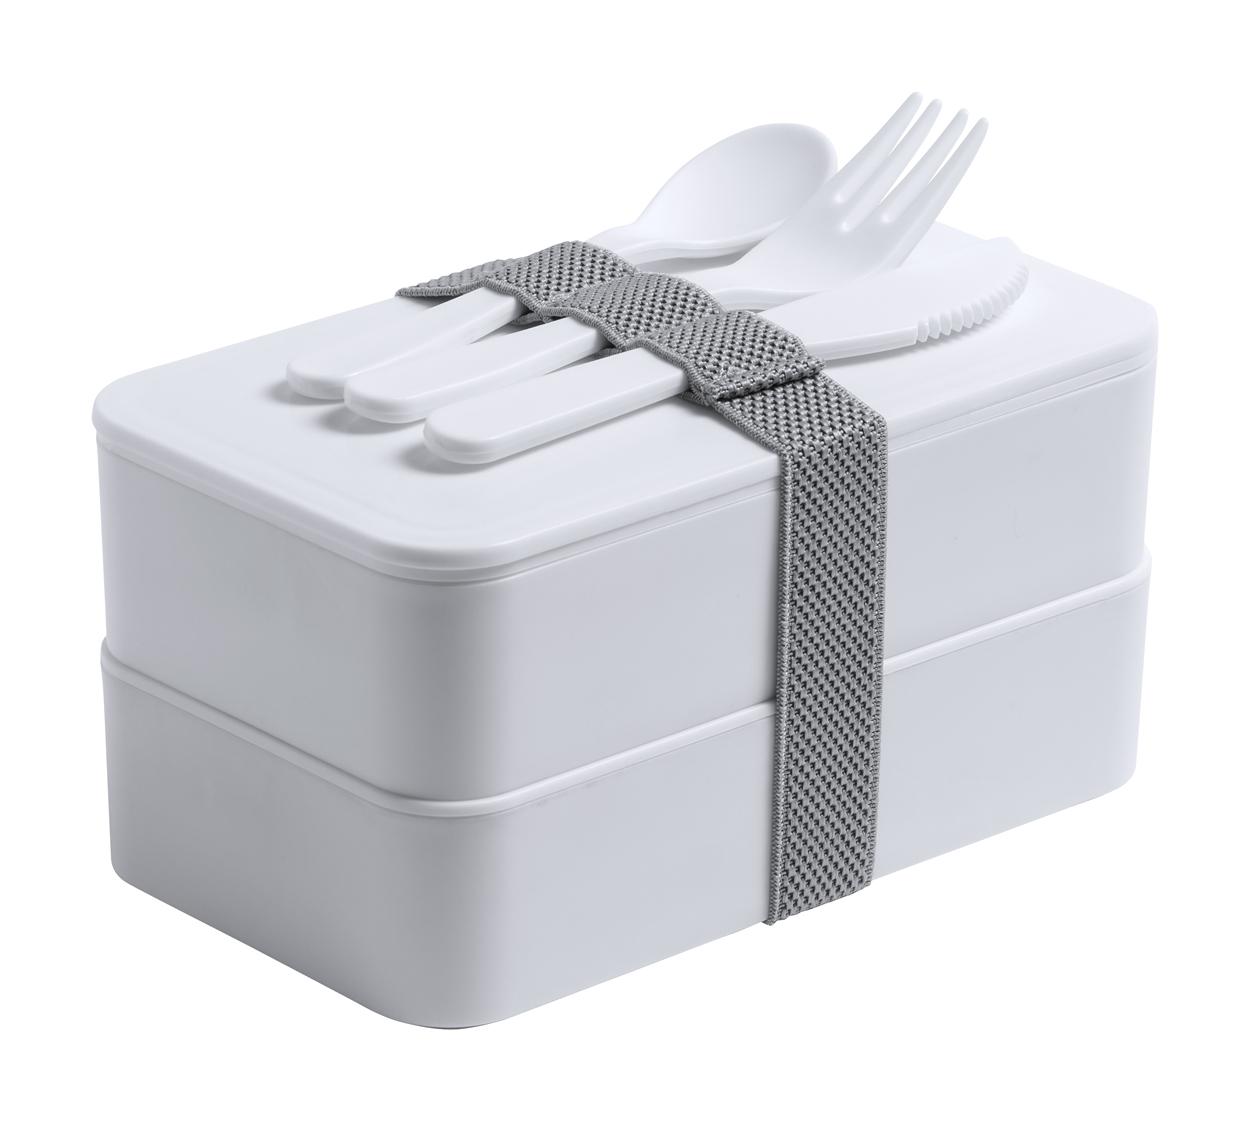 Fandex anti-bacterial lunch box